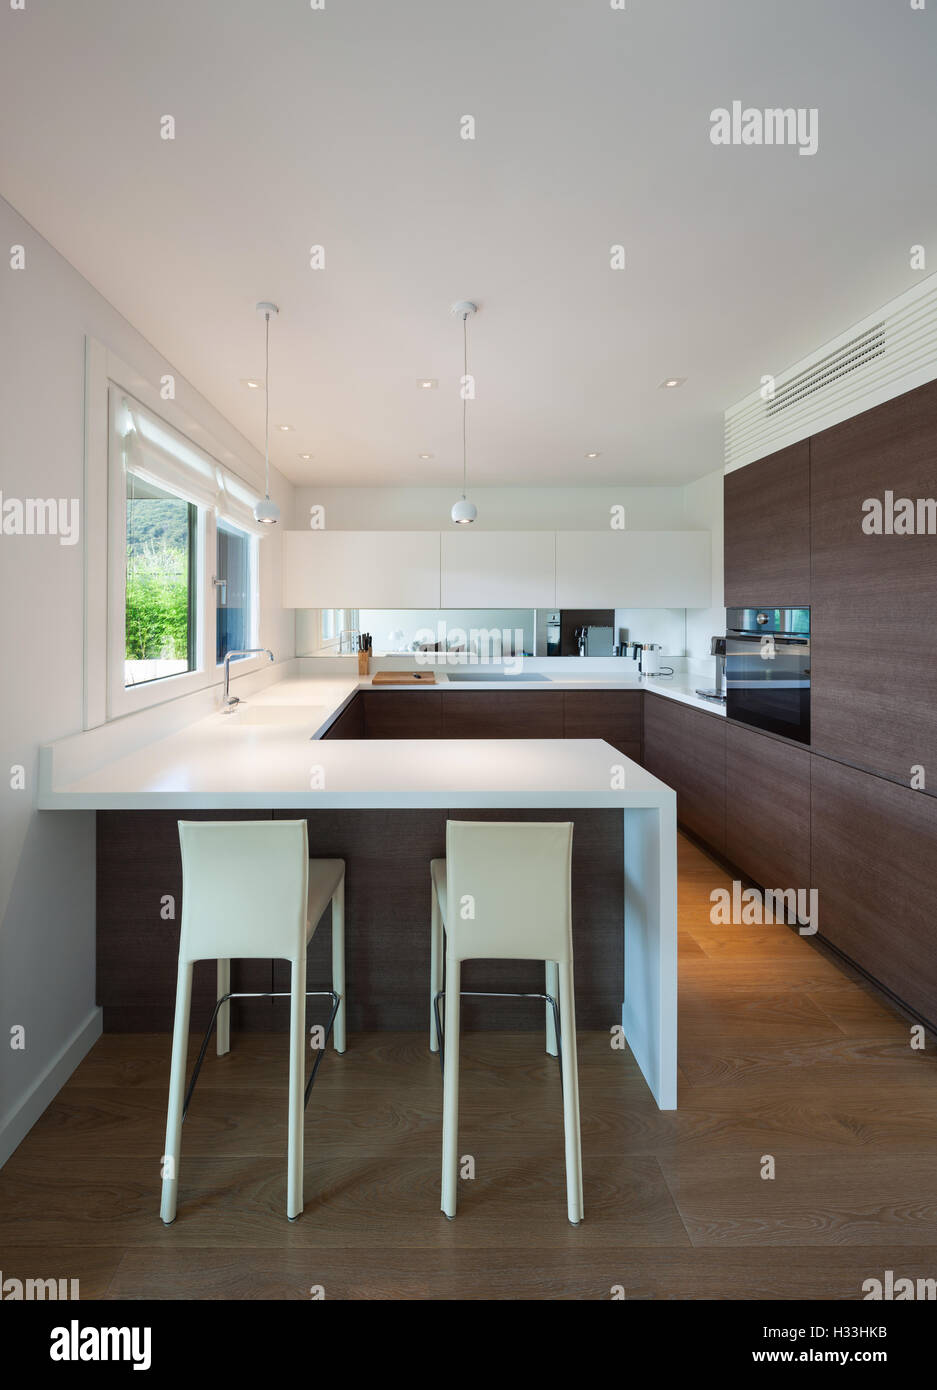 Luxury House Interior Modern Elegant Kitchen Stock Photo 122396271